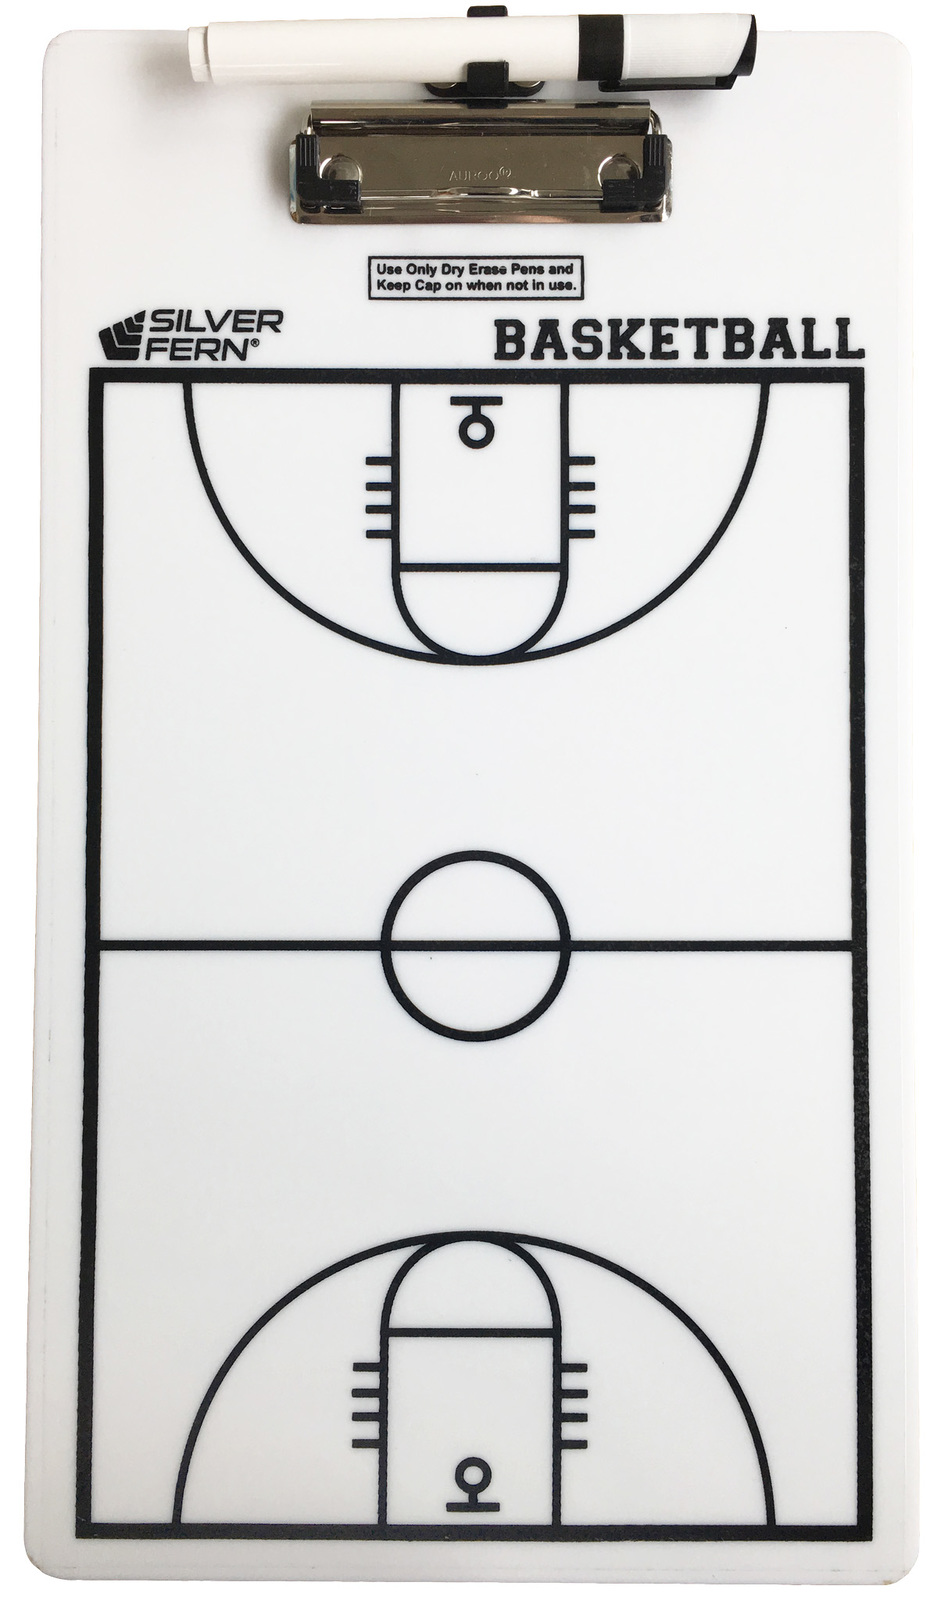 Basketball Coaching Board image